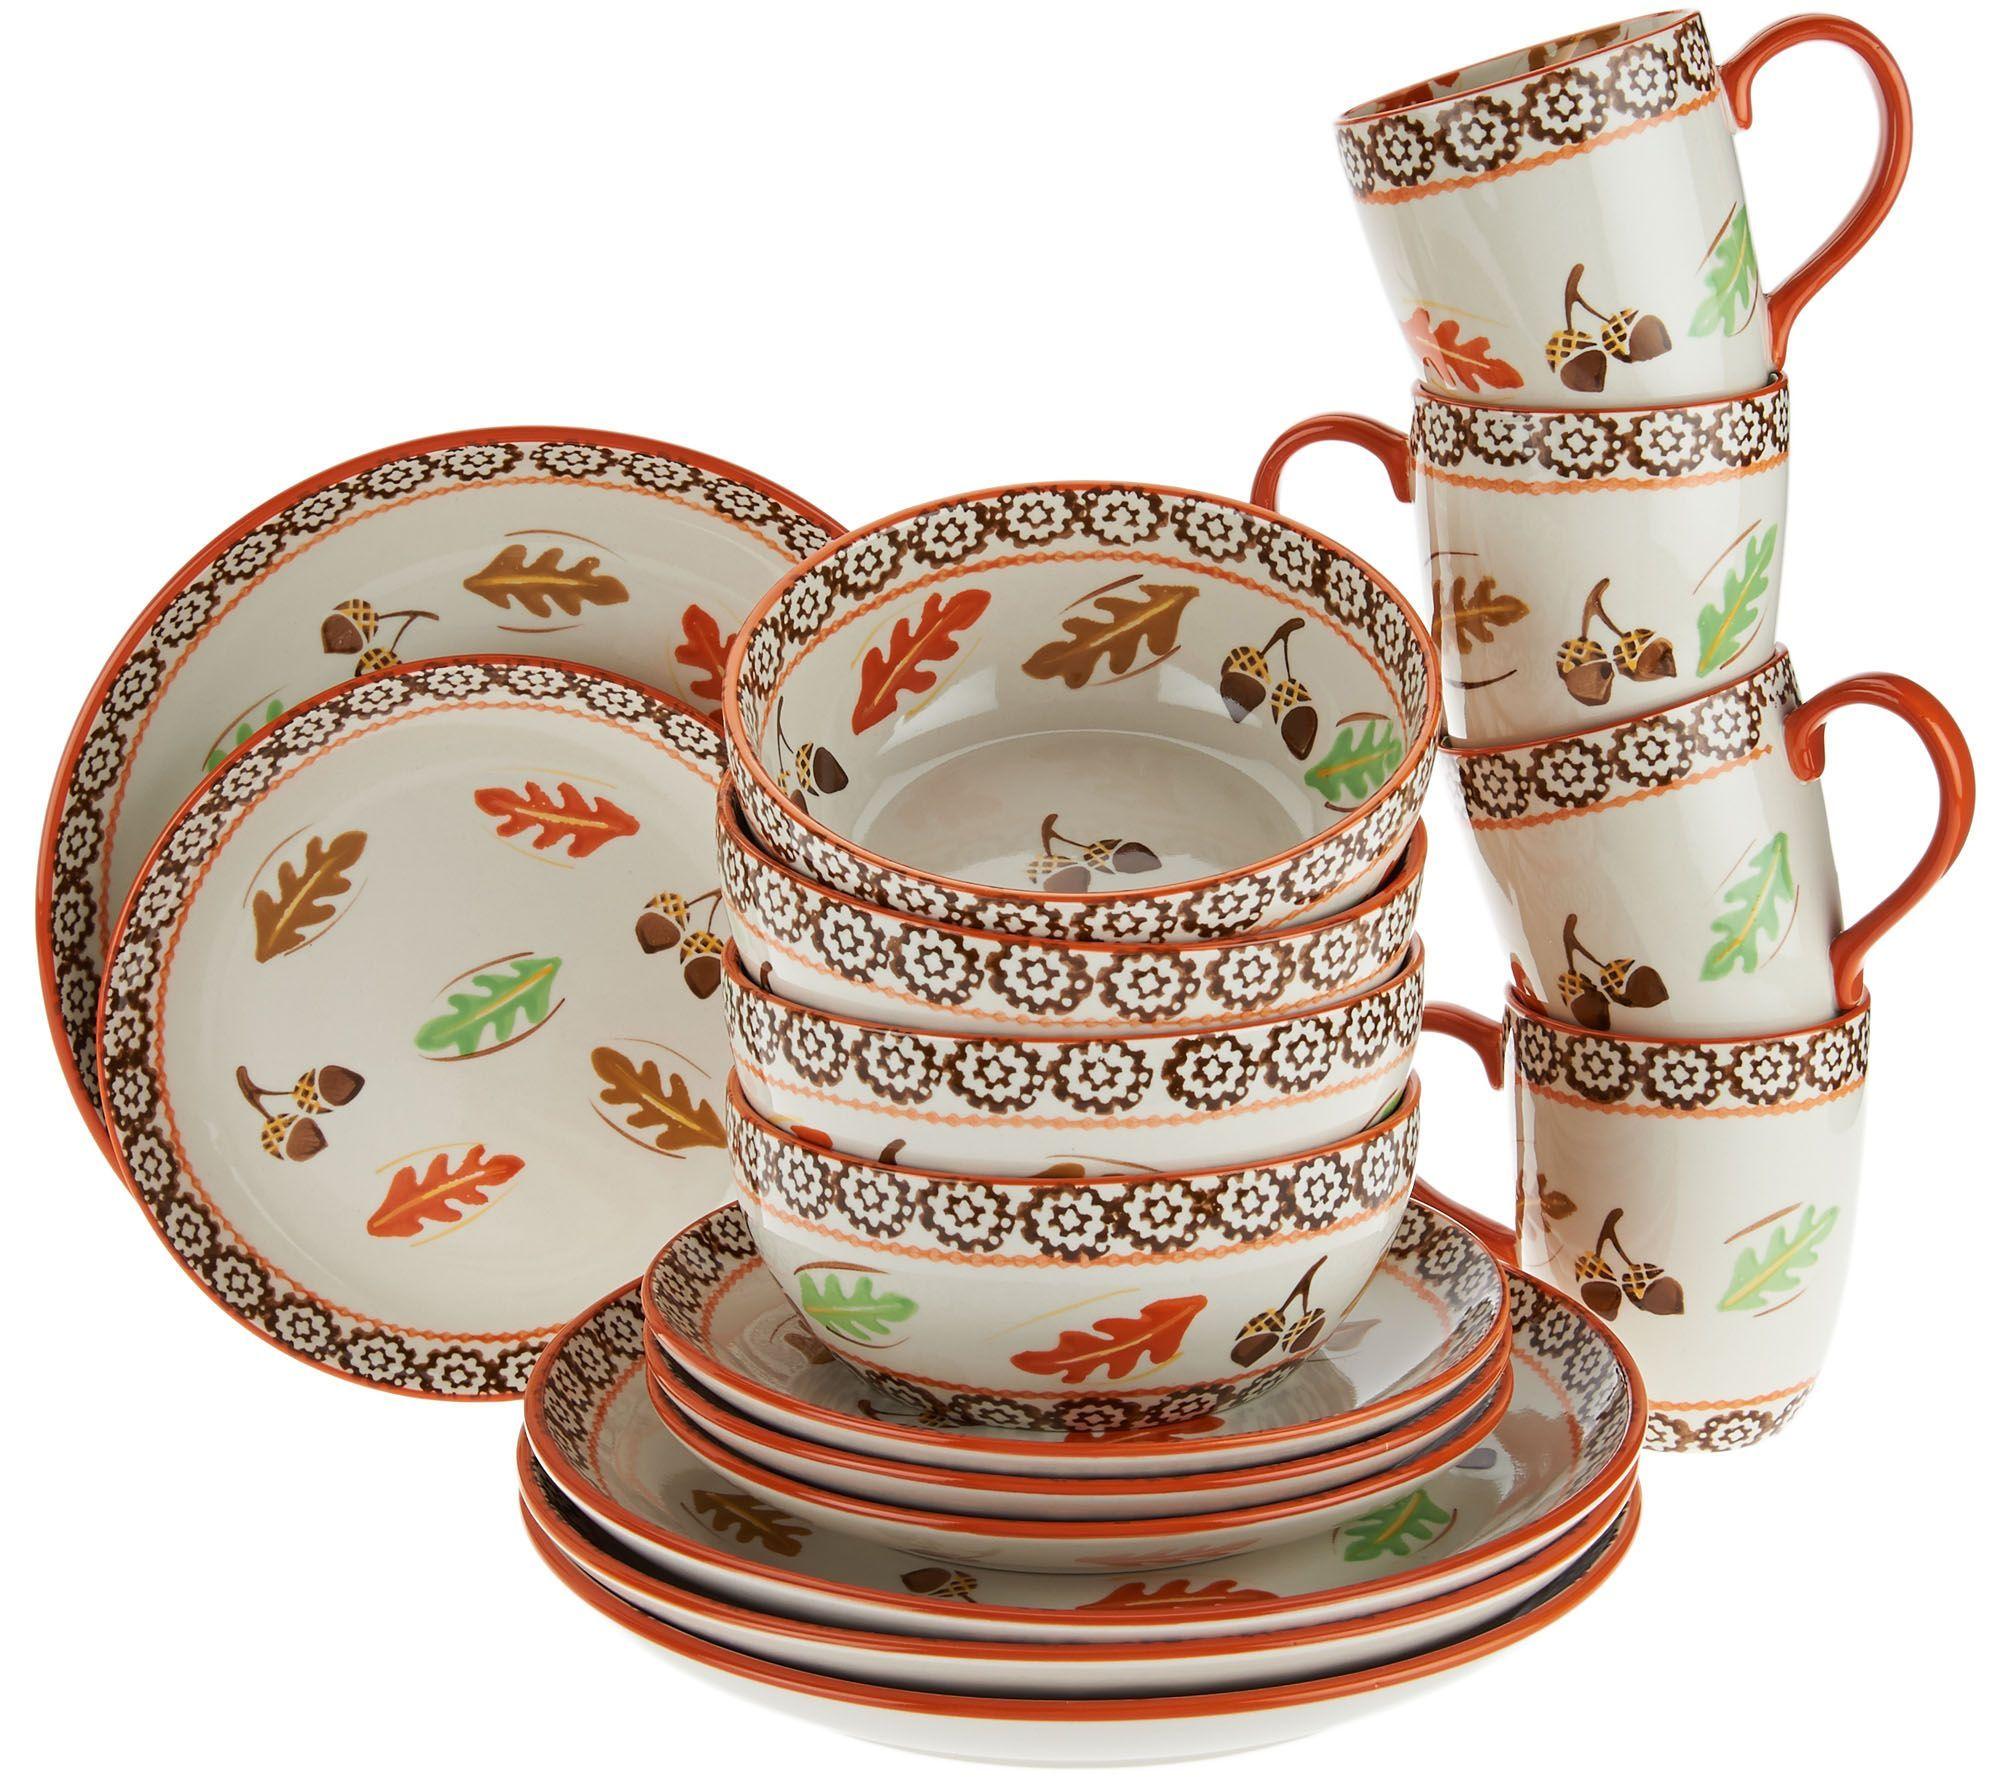 Temp-tations Harvest Dinnerware | QVC | Pinterest | Dinnerware ...